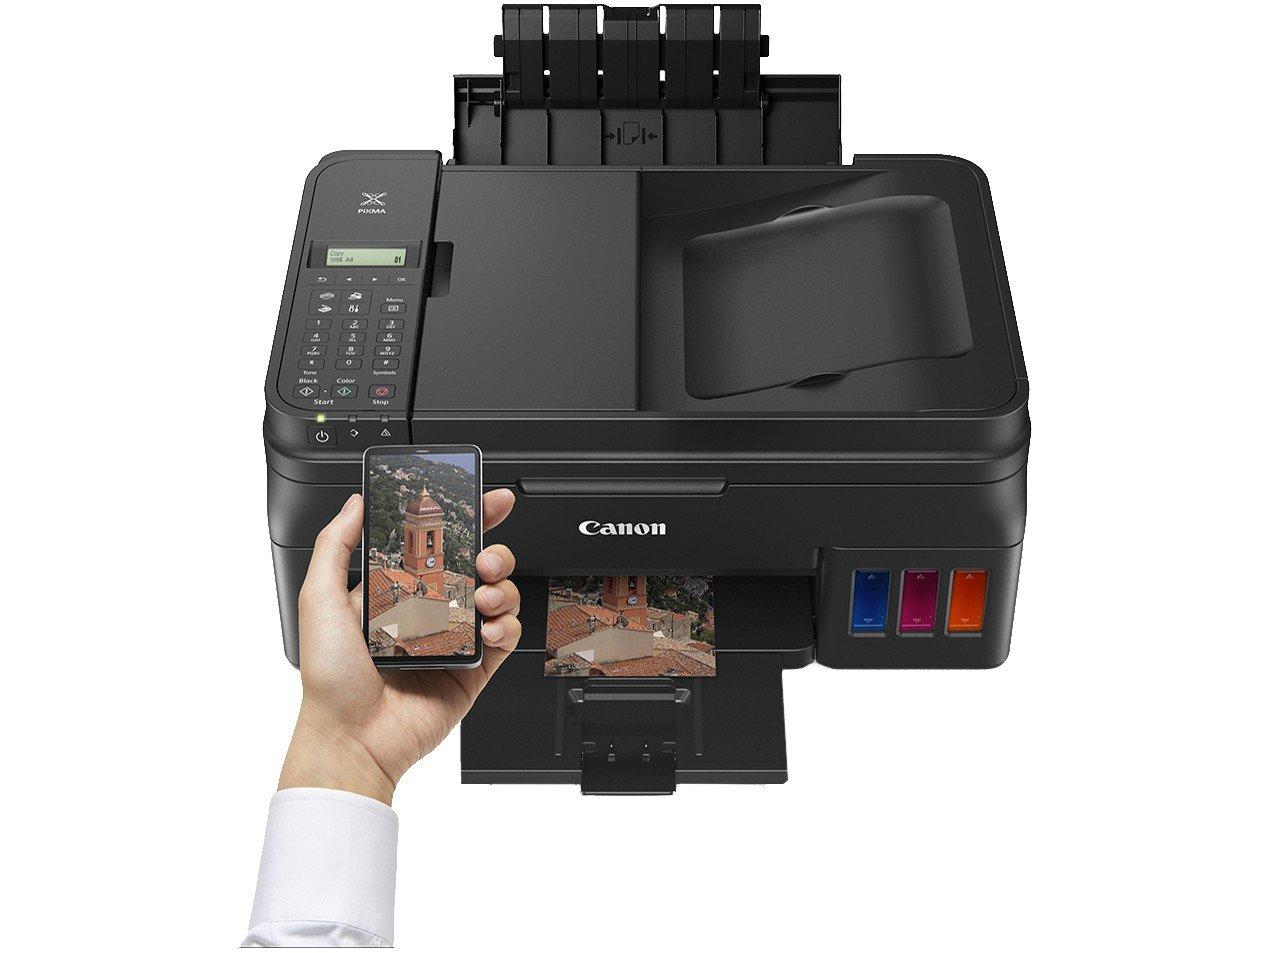 Foto 4 - Impressora Multifuncional Canon G4100 - Tanque de Tinta Colorido Wi-Fi USB